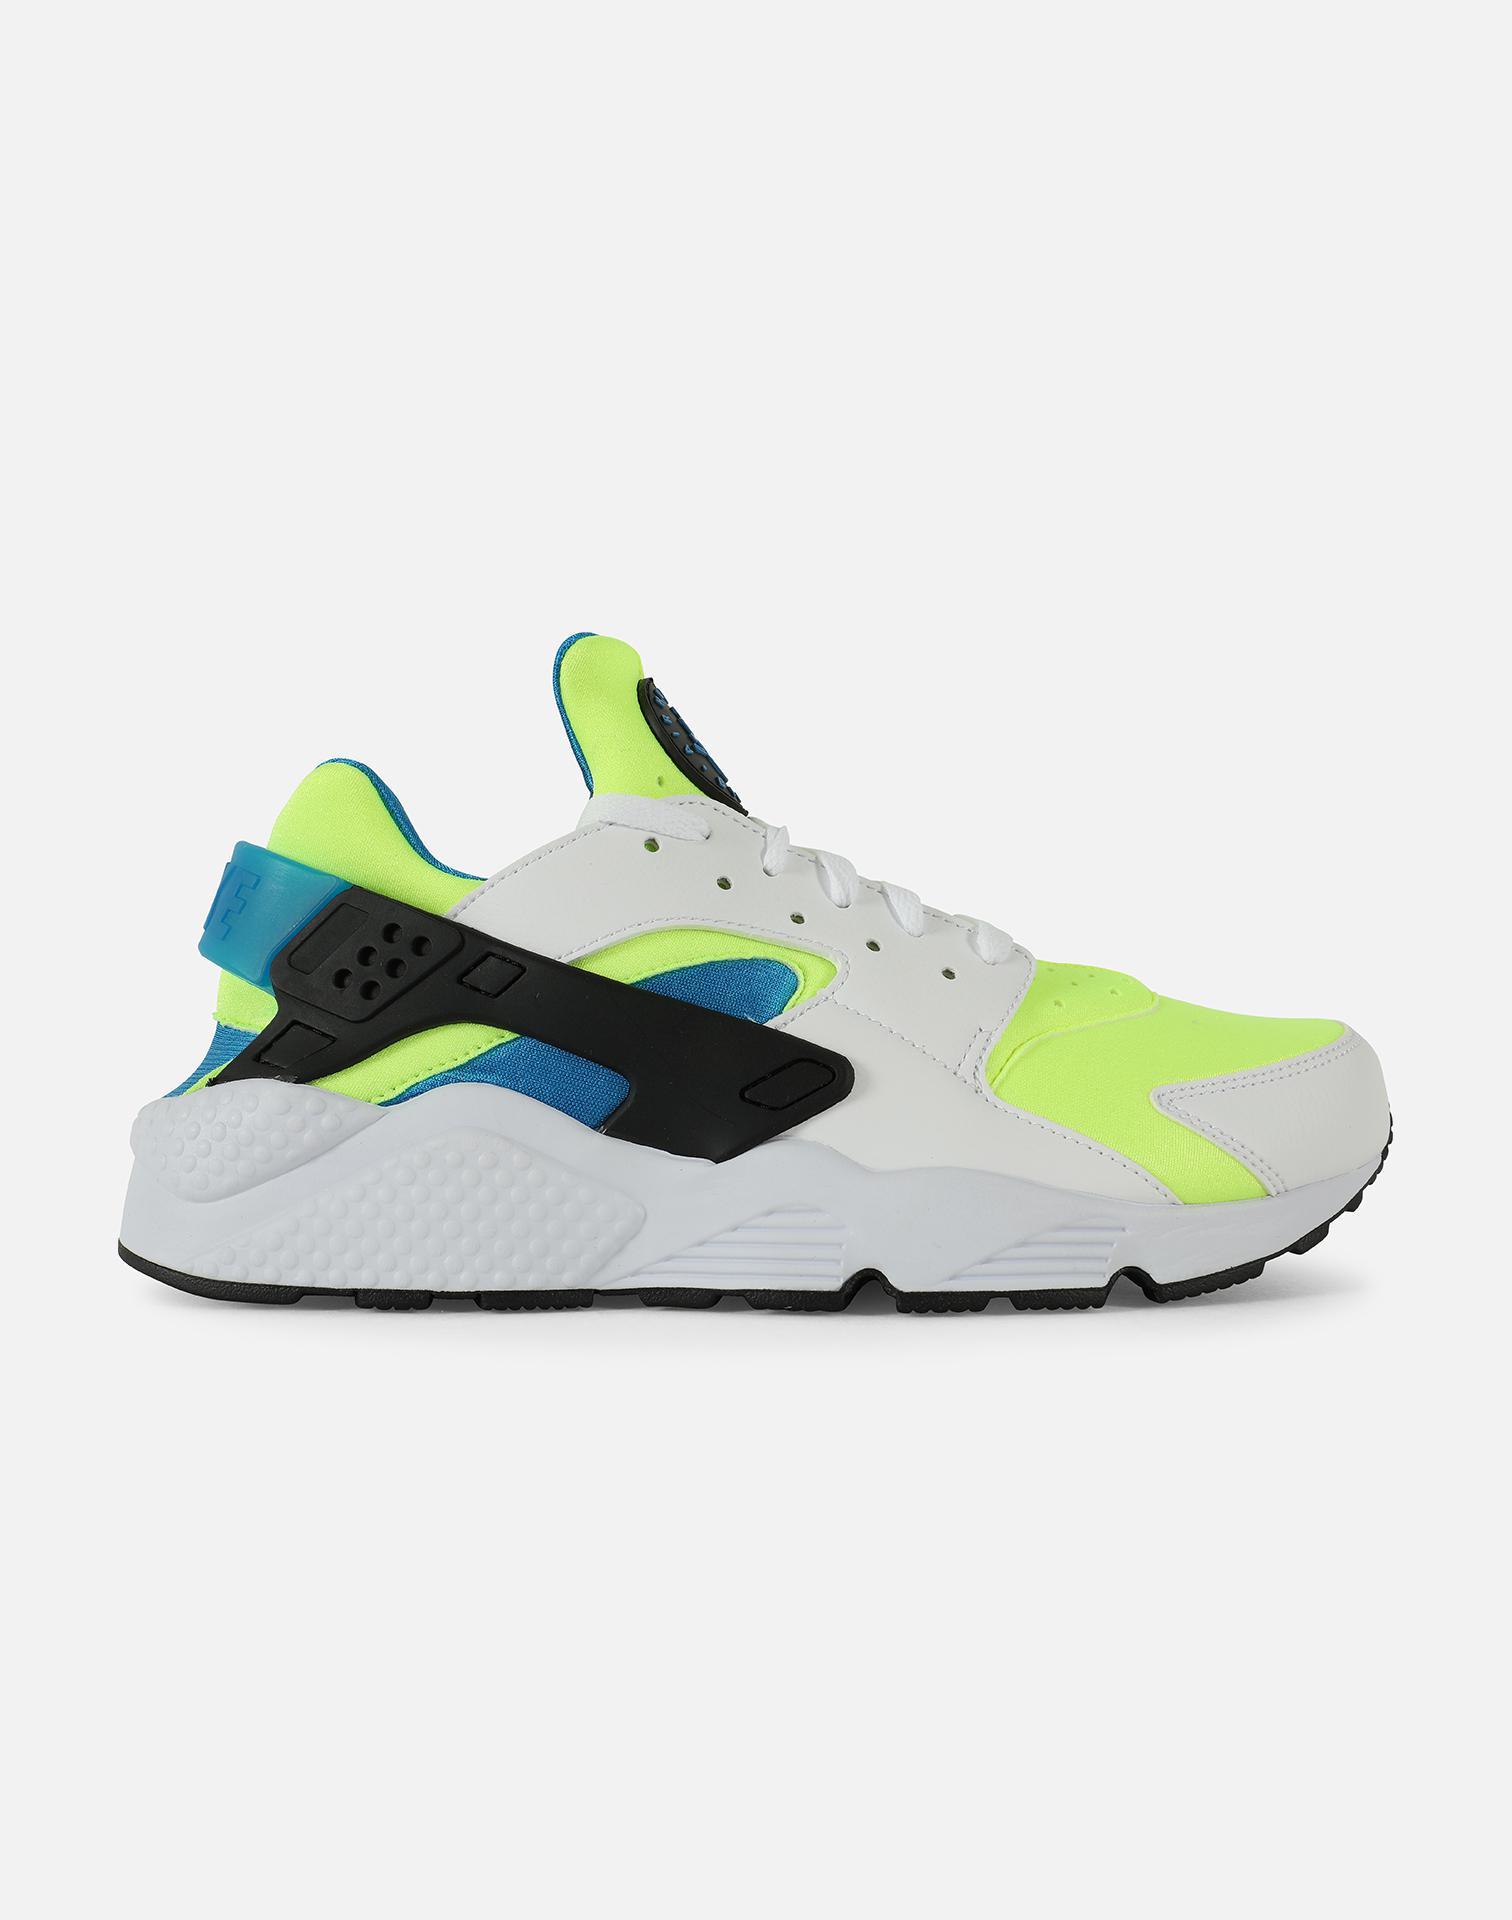 Lyst Lyst Lyst Nike Air Huarache Run Se in bianca for Uomo e46179